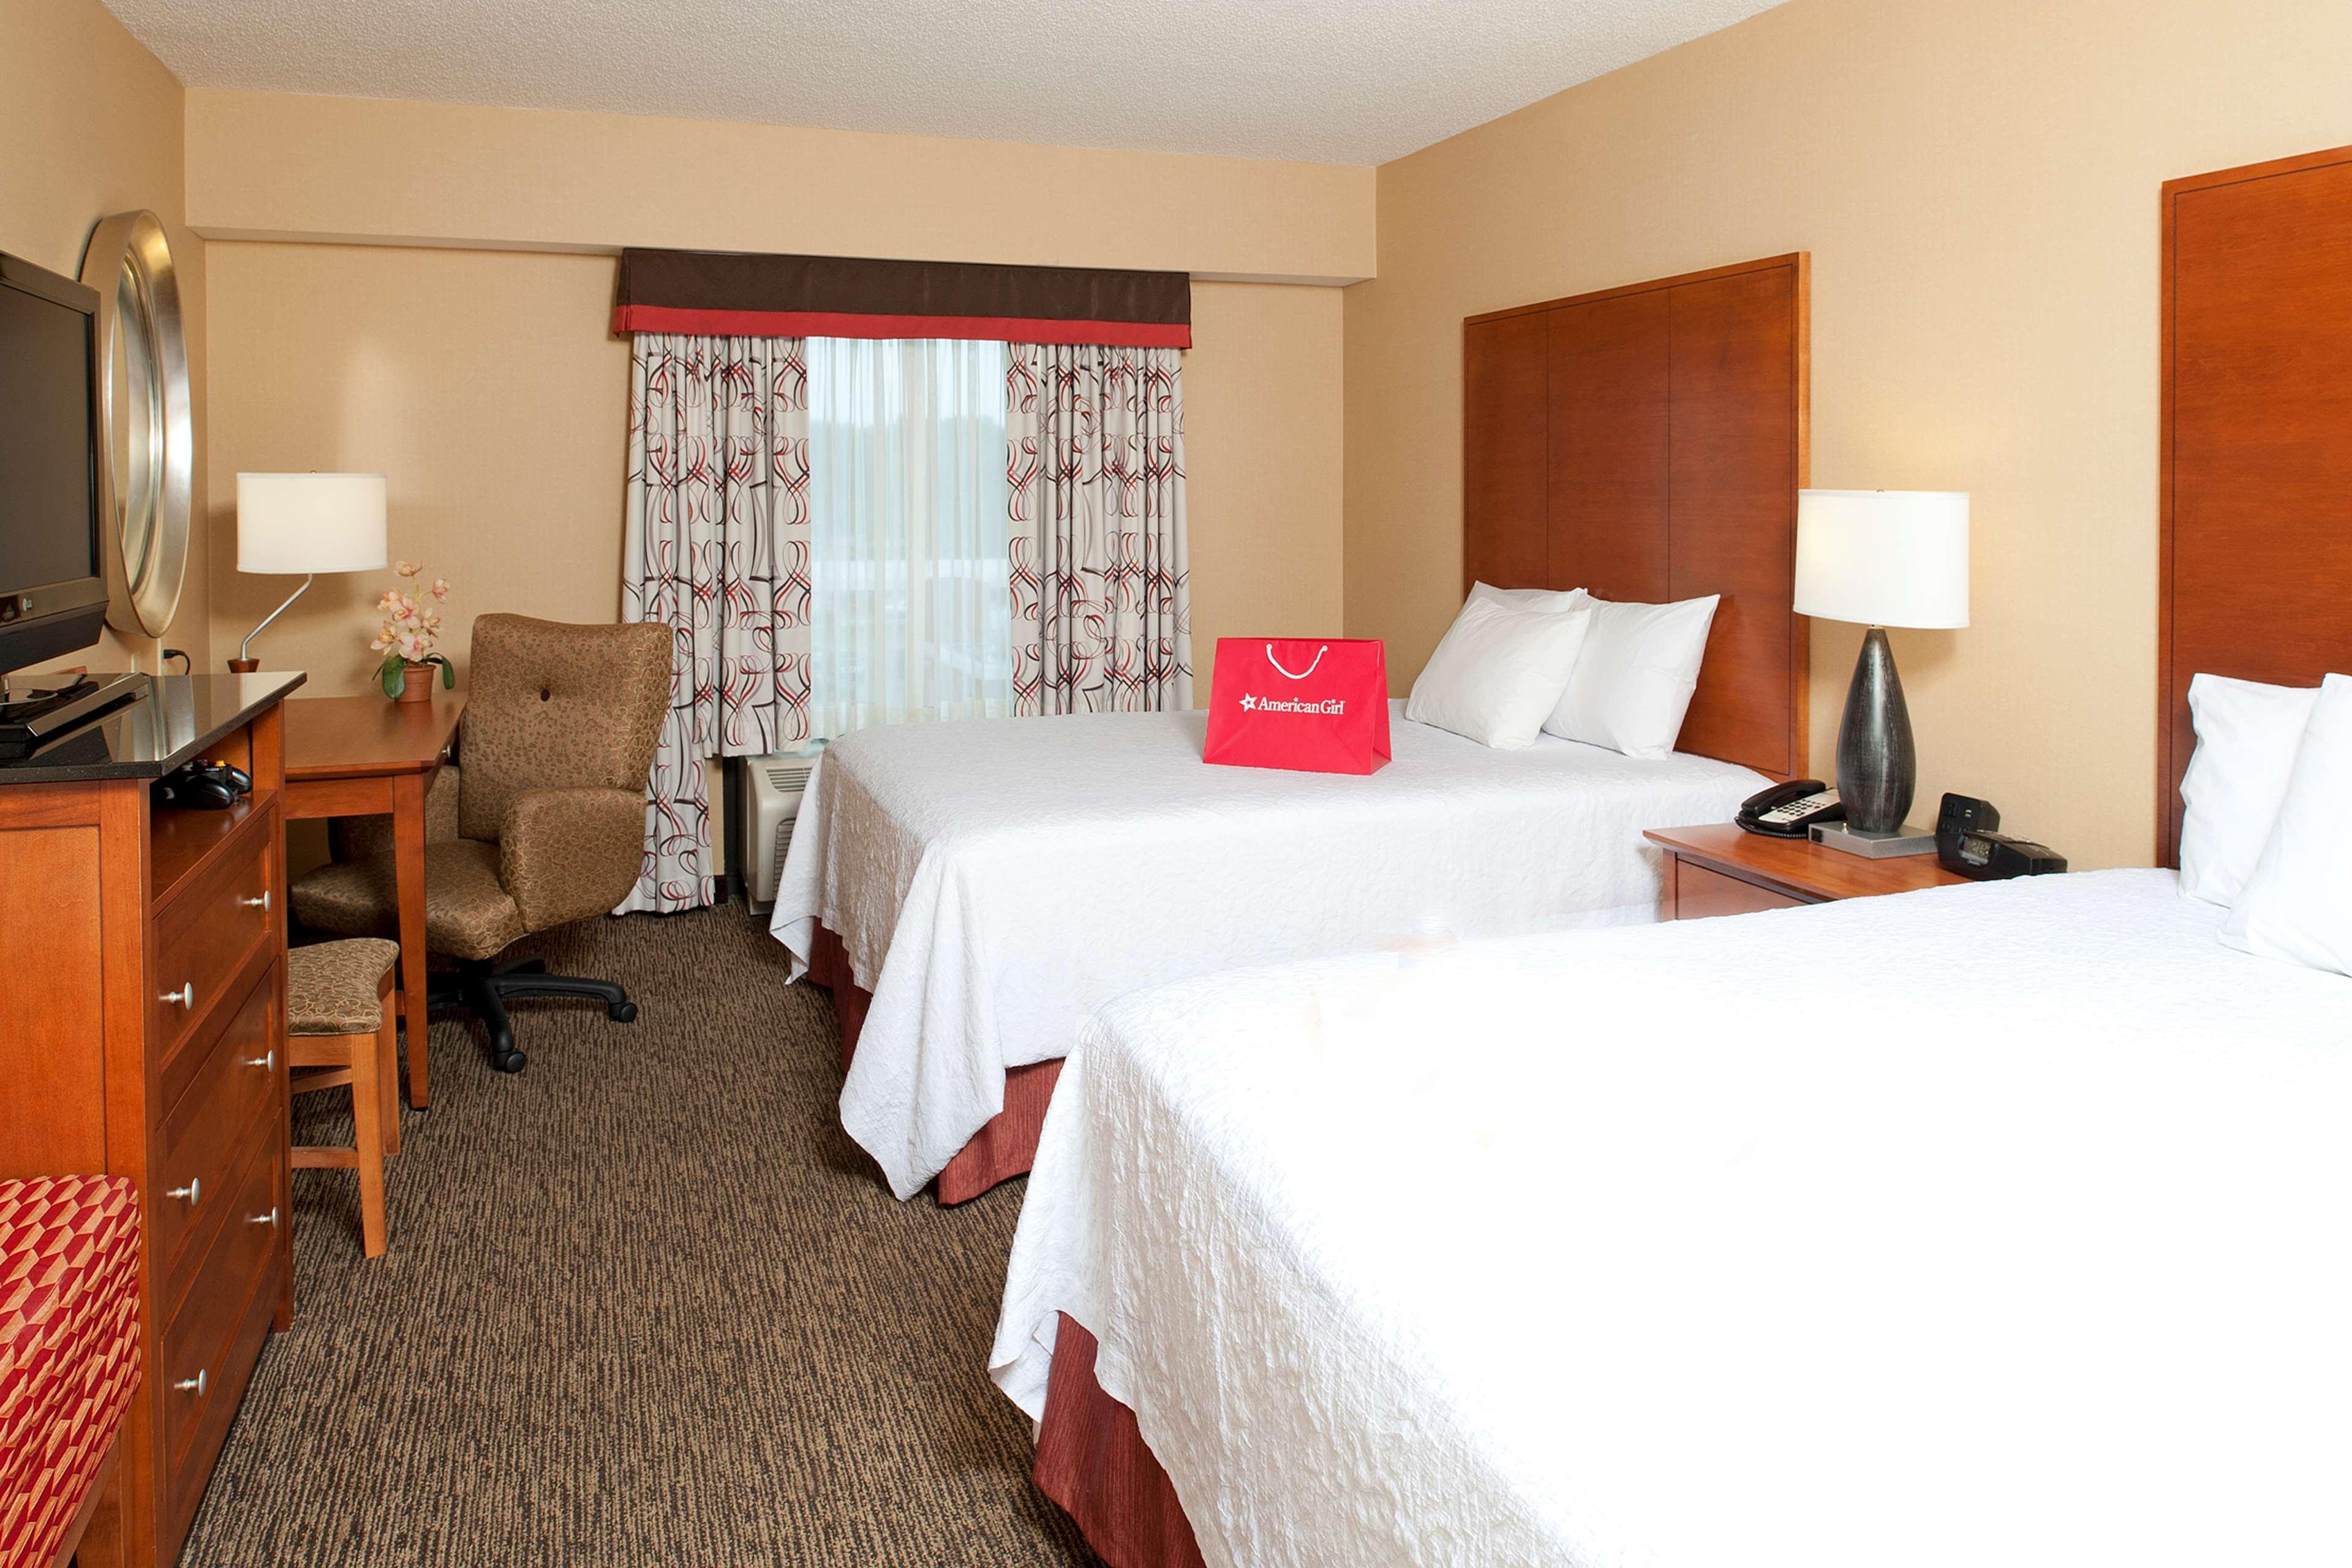 Hampton Inn & Suites Columbus-Easton Area image 31